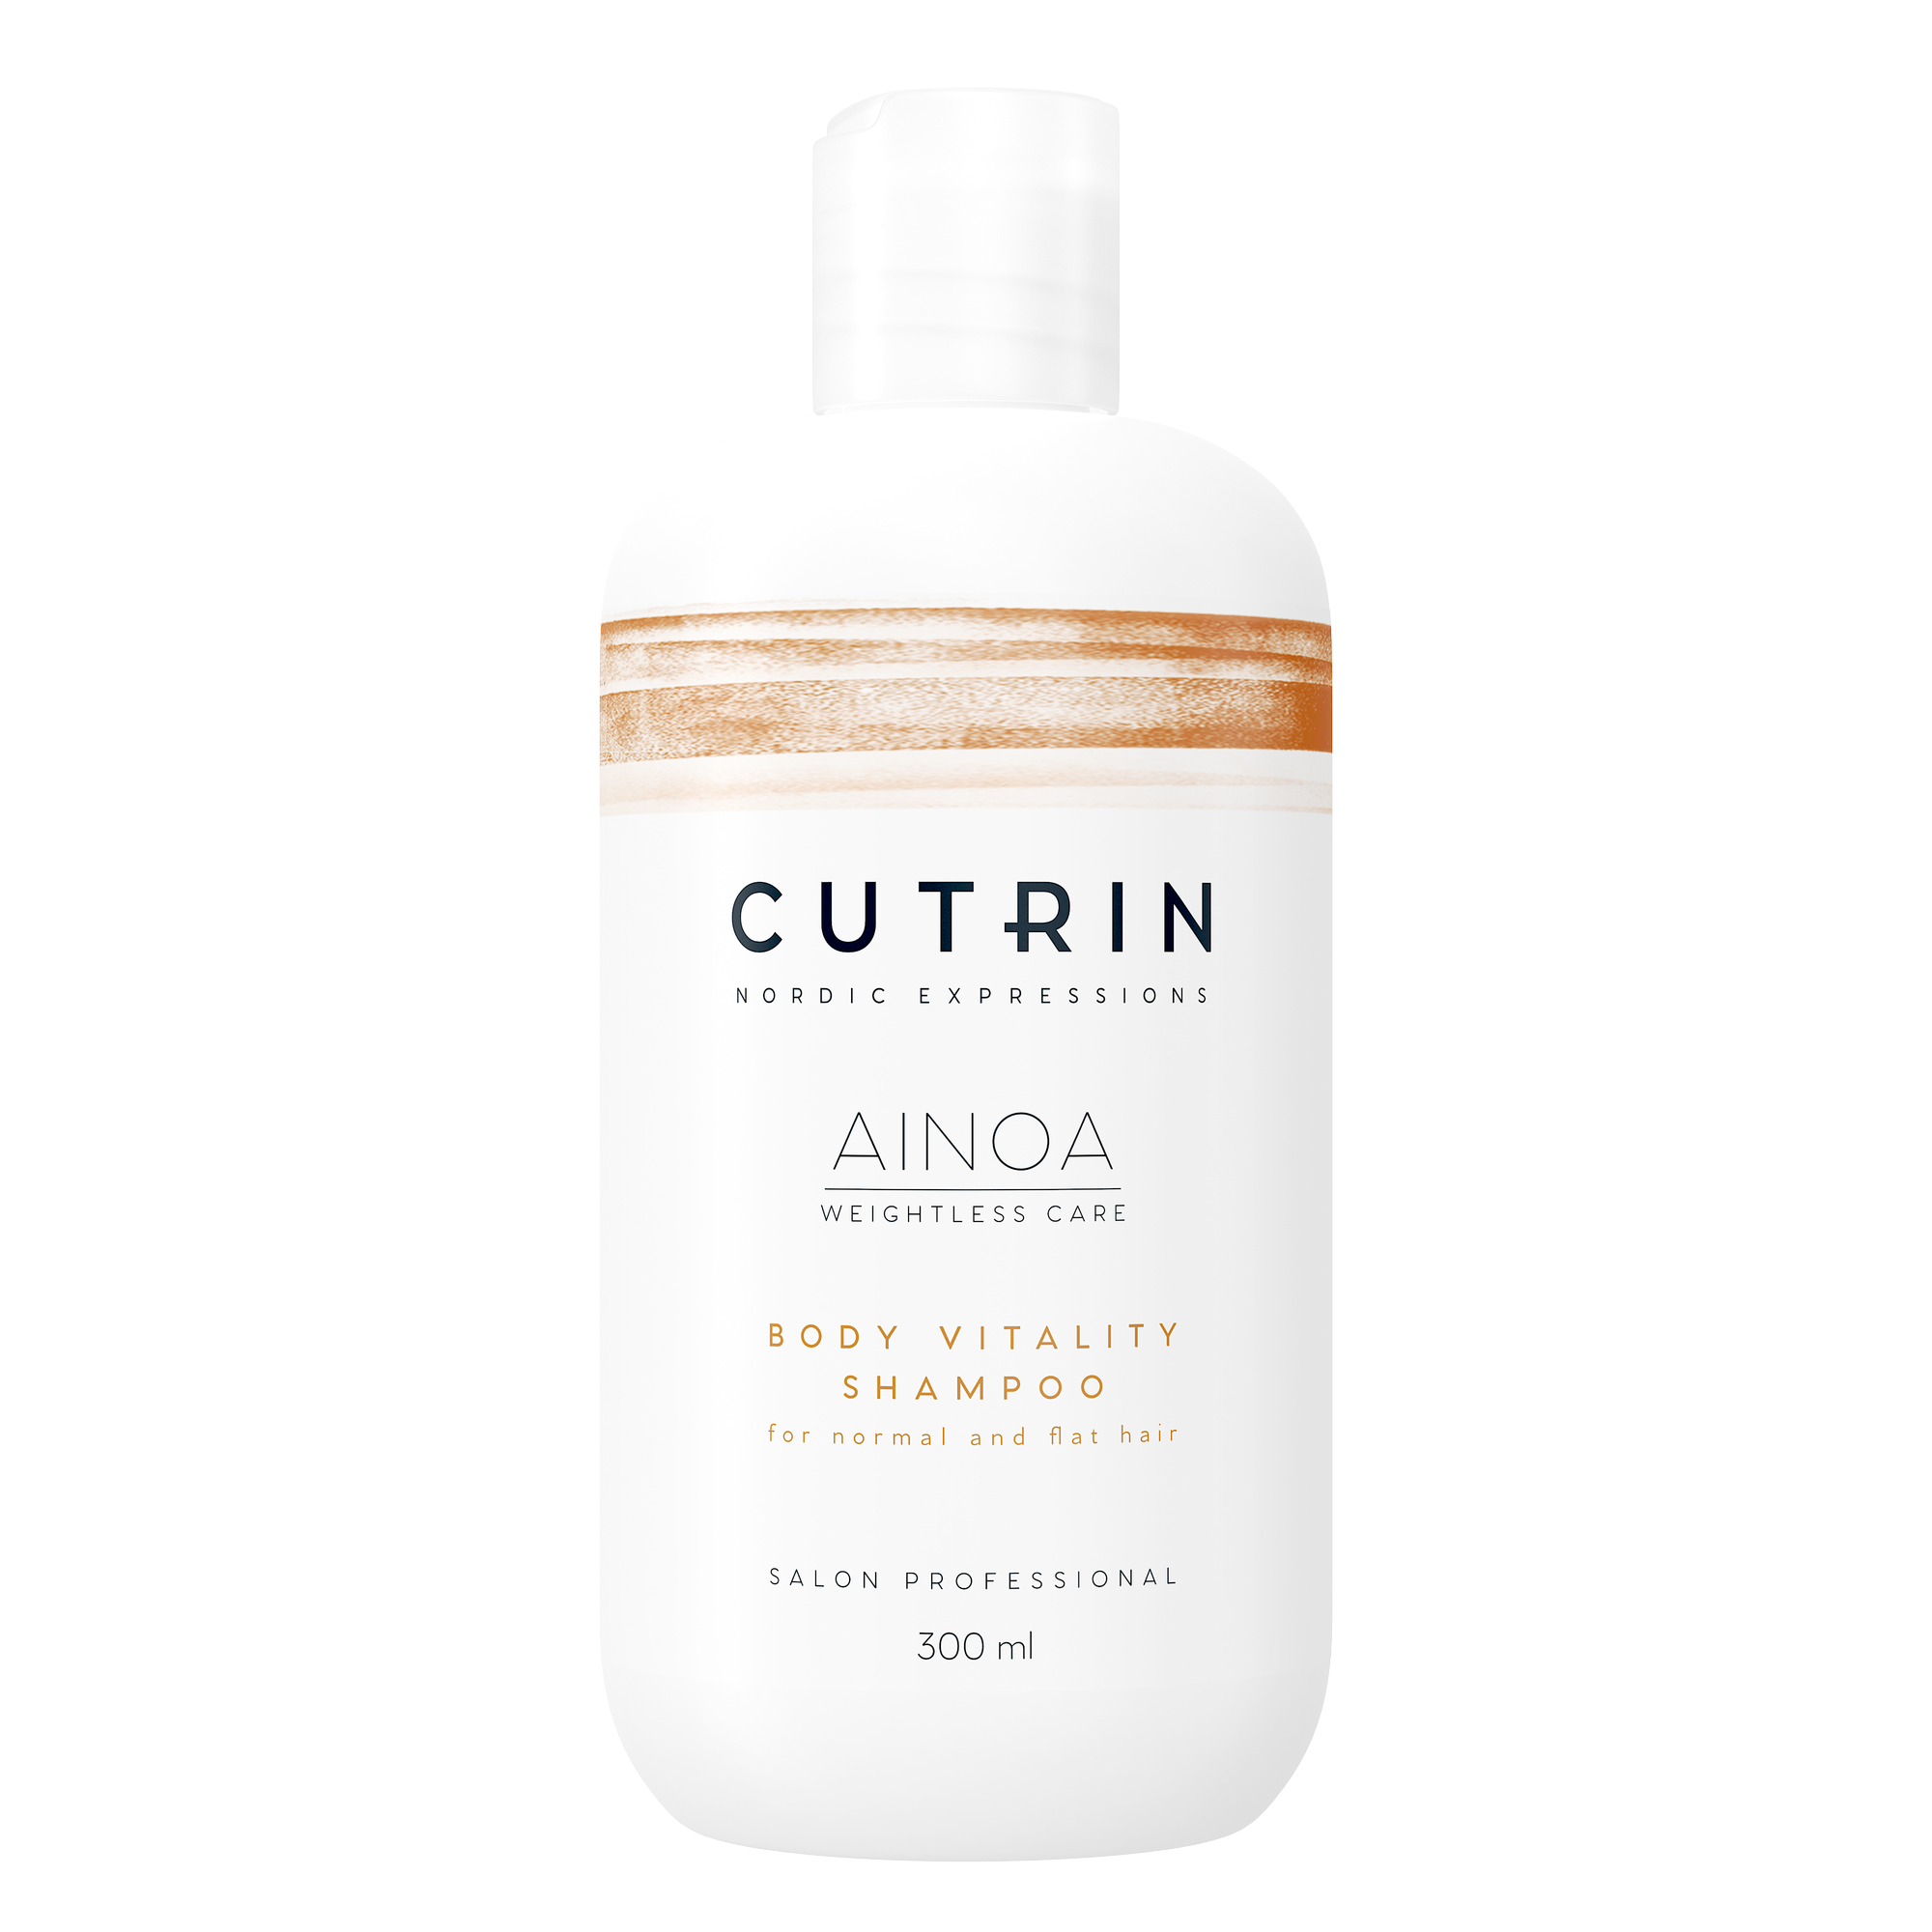 CUTRIN Шампунь для укрепления волос / AINOA BODY VITALITY 300 мл.